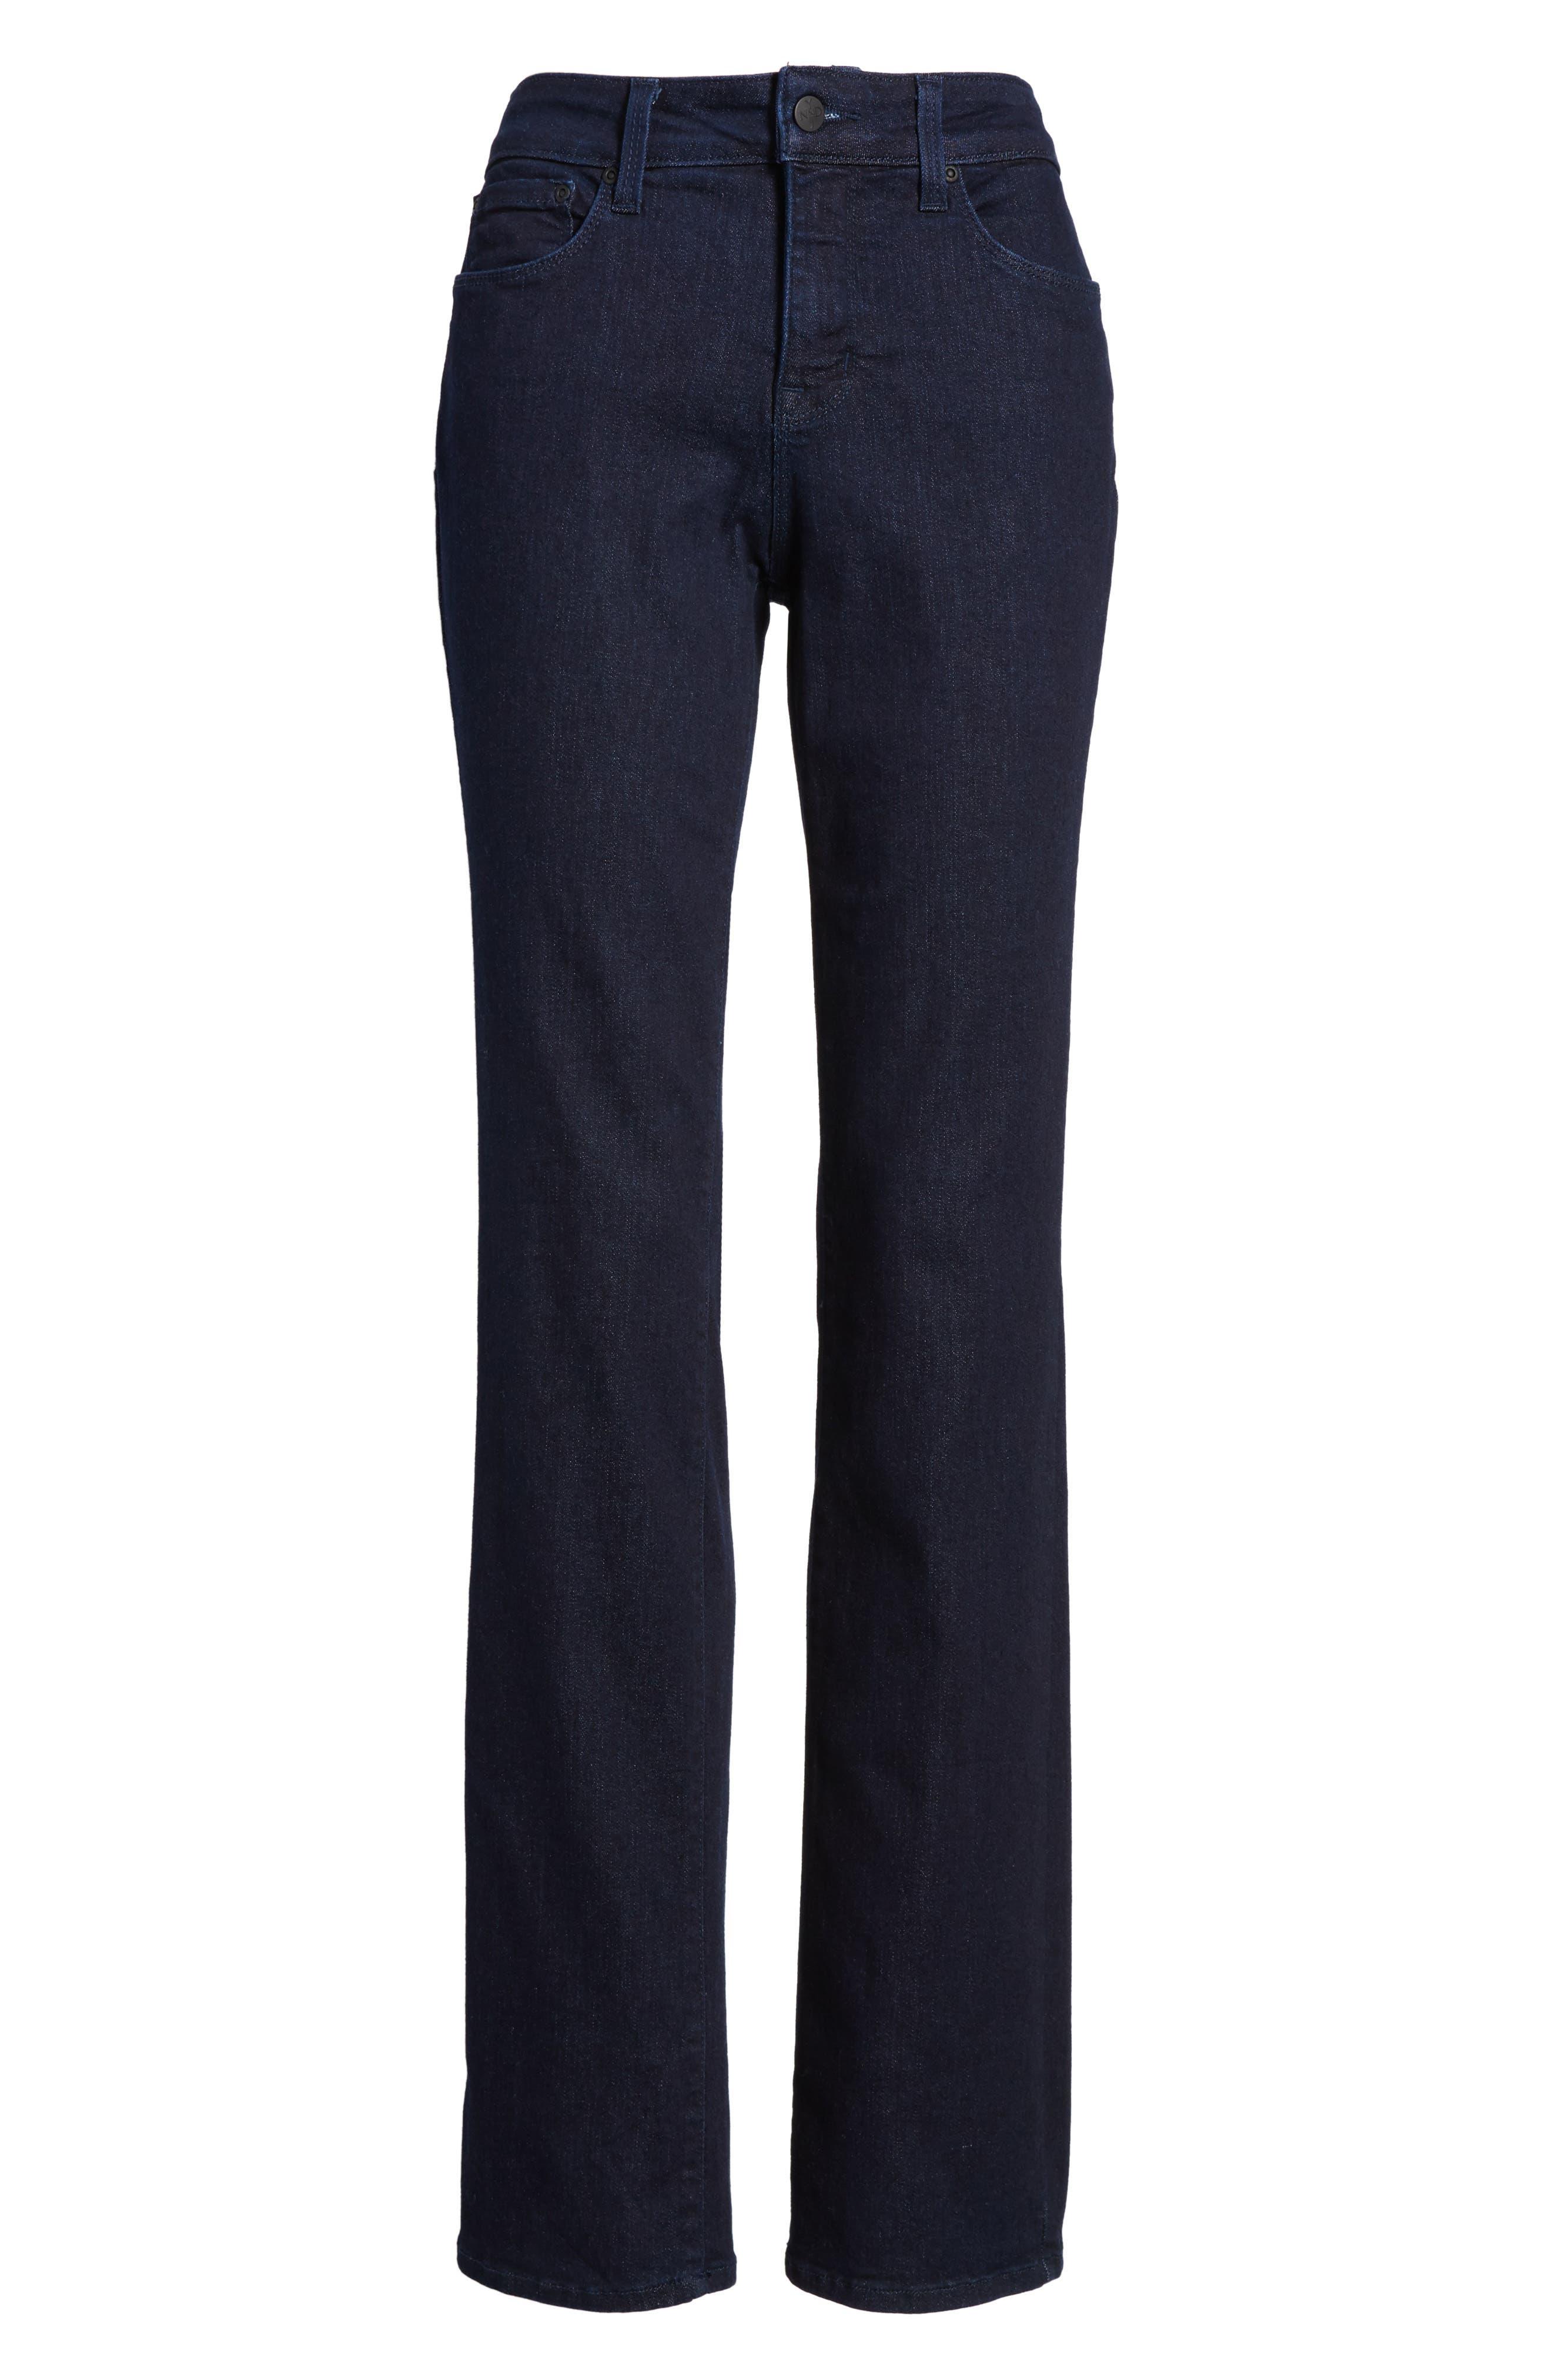 NYDJ,                             Marilyn Straight Leg Jeans,                             Alternate thumbnail 6, color,                             408